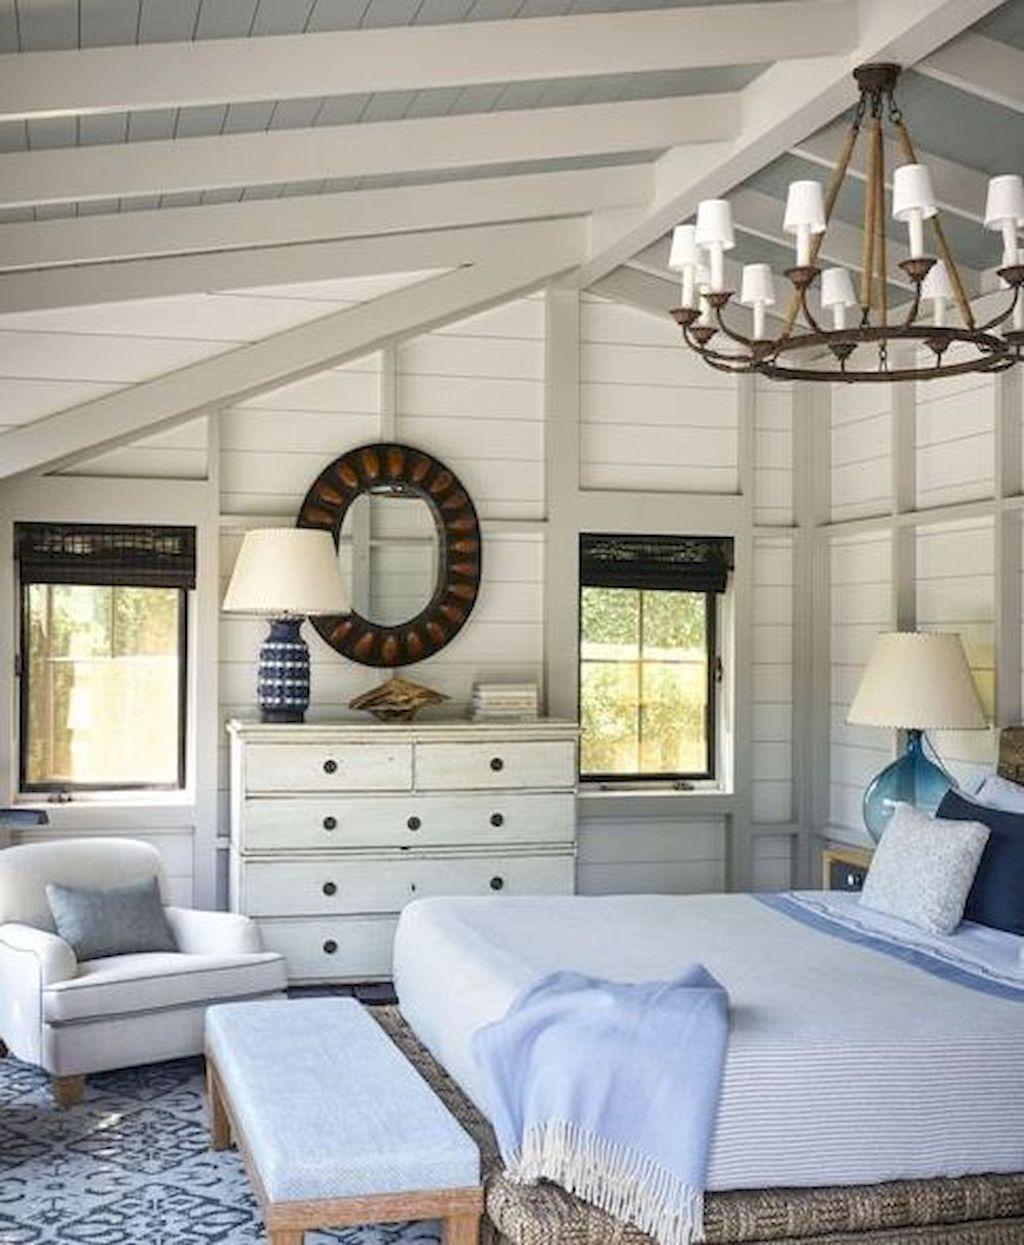 55 Modern Lake House Bedroom Ideas Crowdecor Com Coastal Style Bedroom Coastal Bedrooms Lakehouse Bedroom